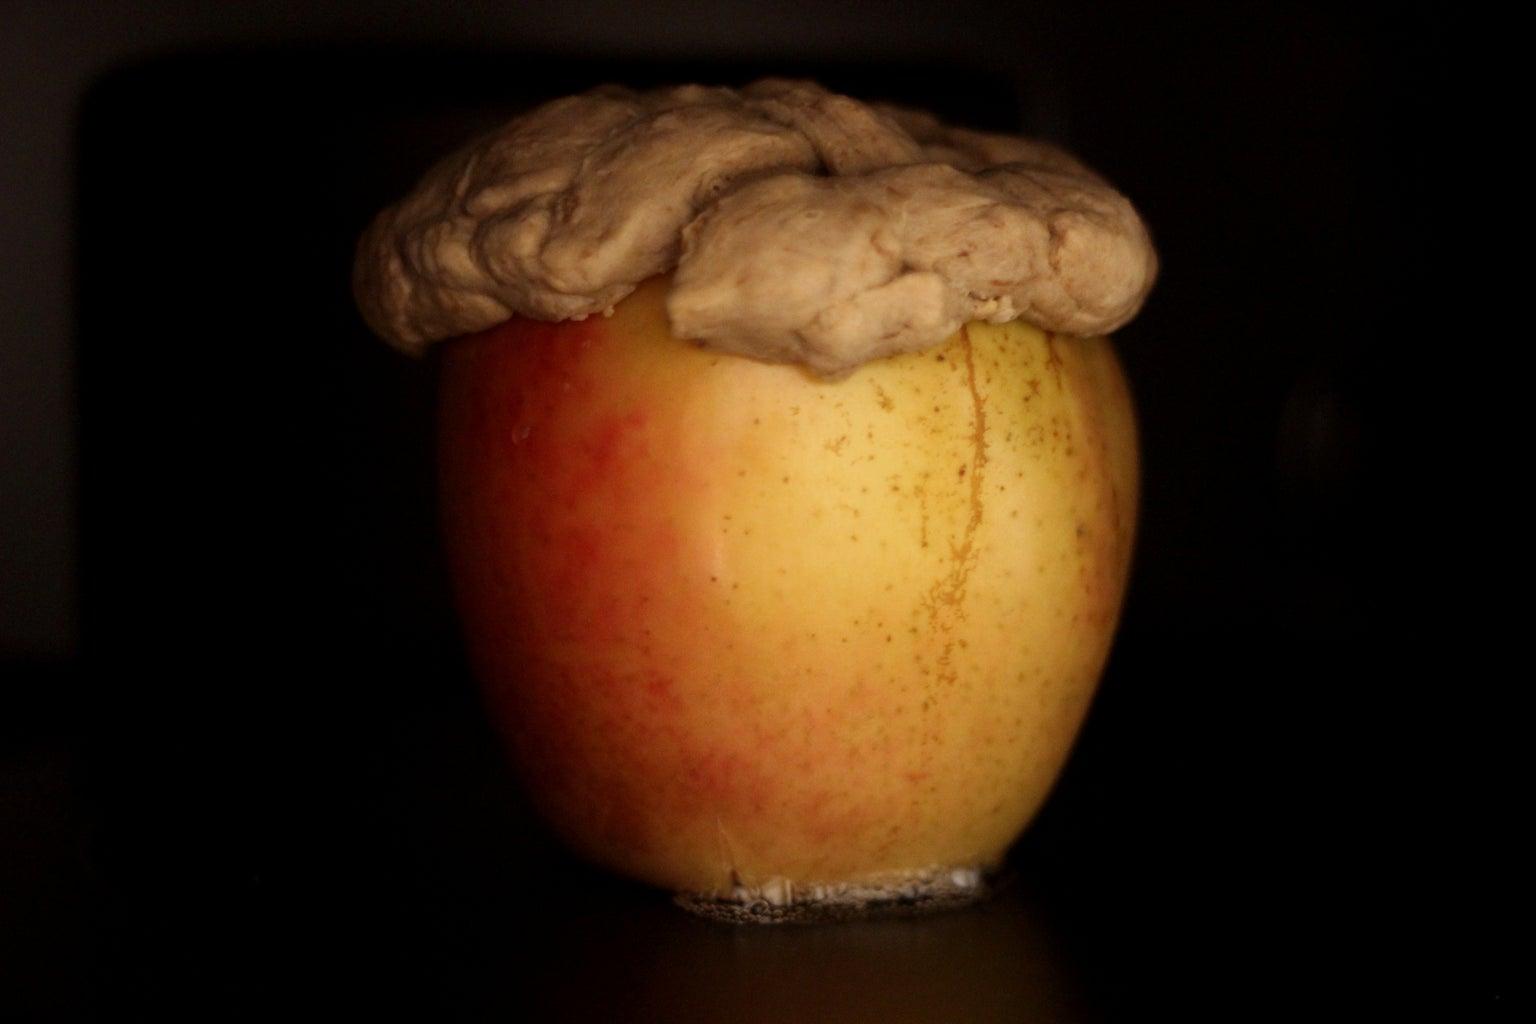 Apple Pie in the Apple